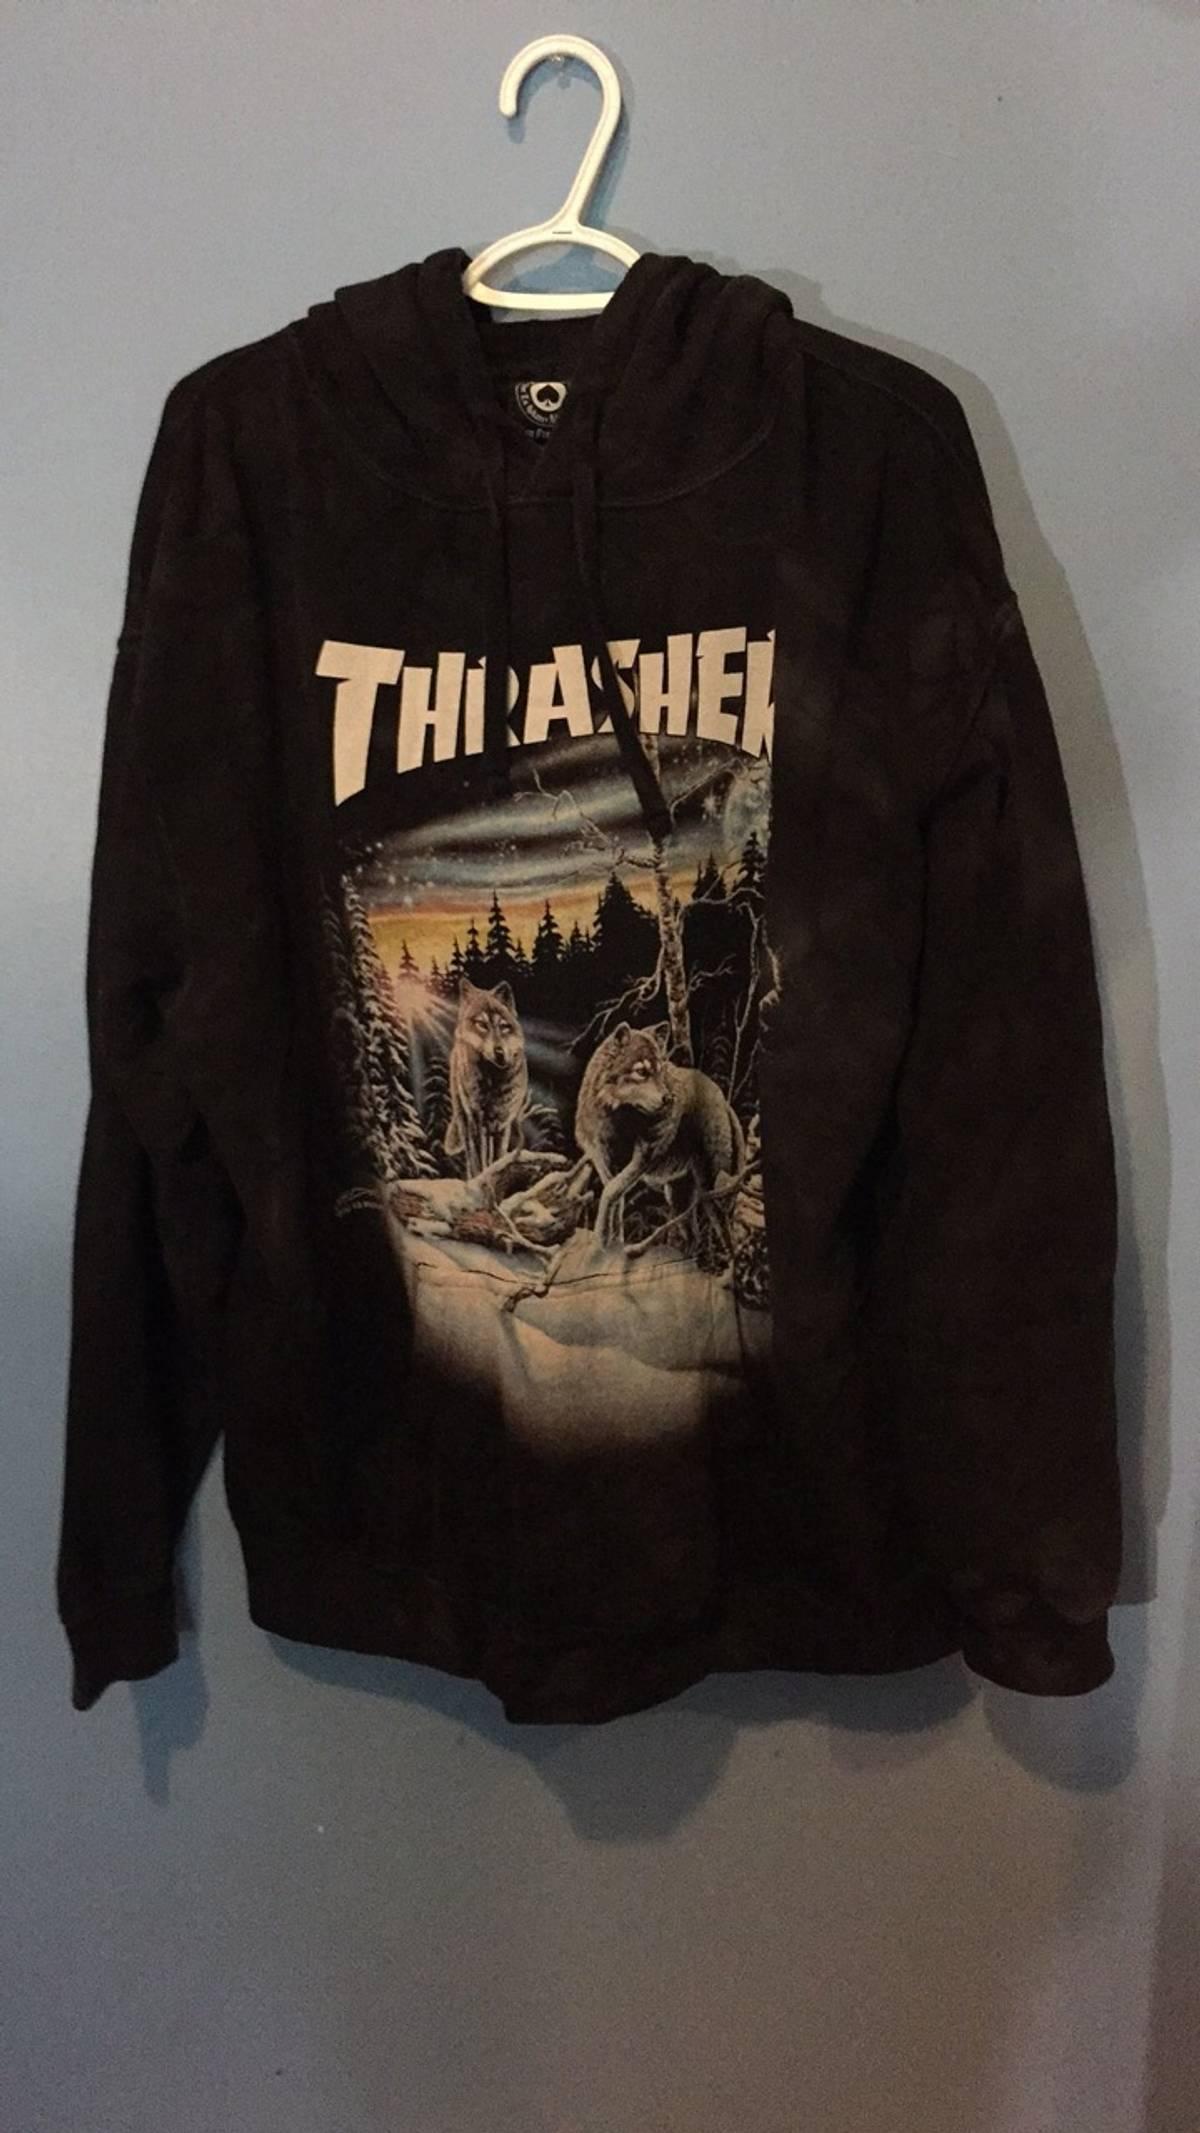 d36cdb4075d9 Thrasher Thrasher 12 Wolves Size xl - Sweatshirts   Hoodies for Sale ...